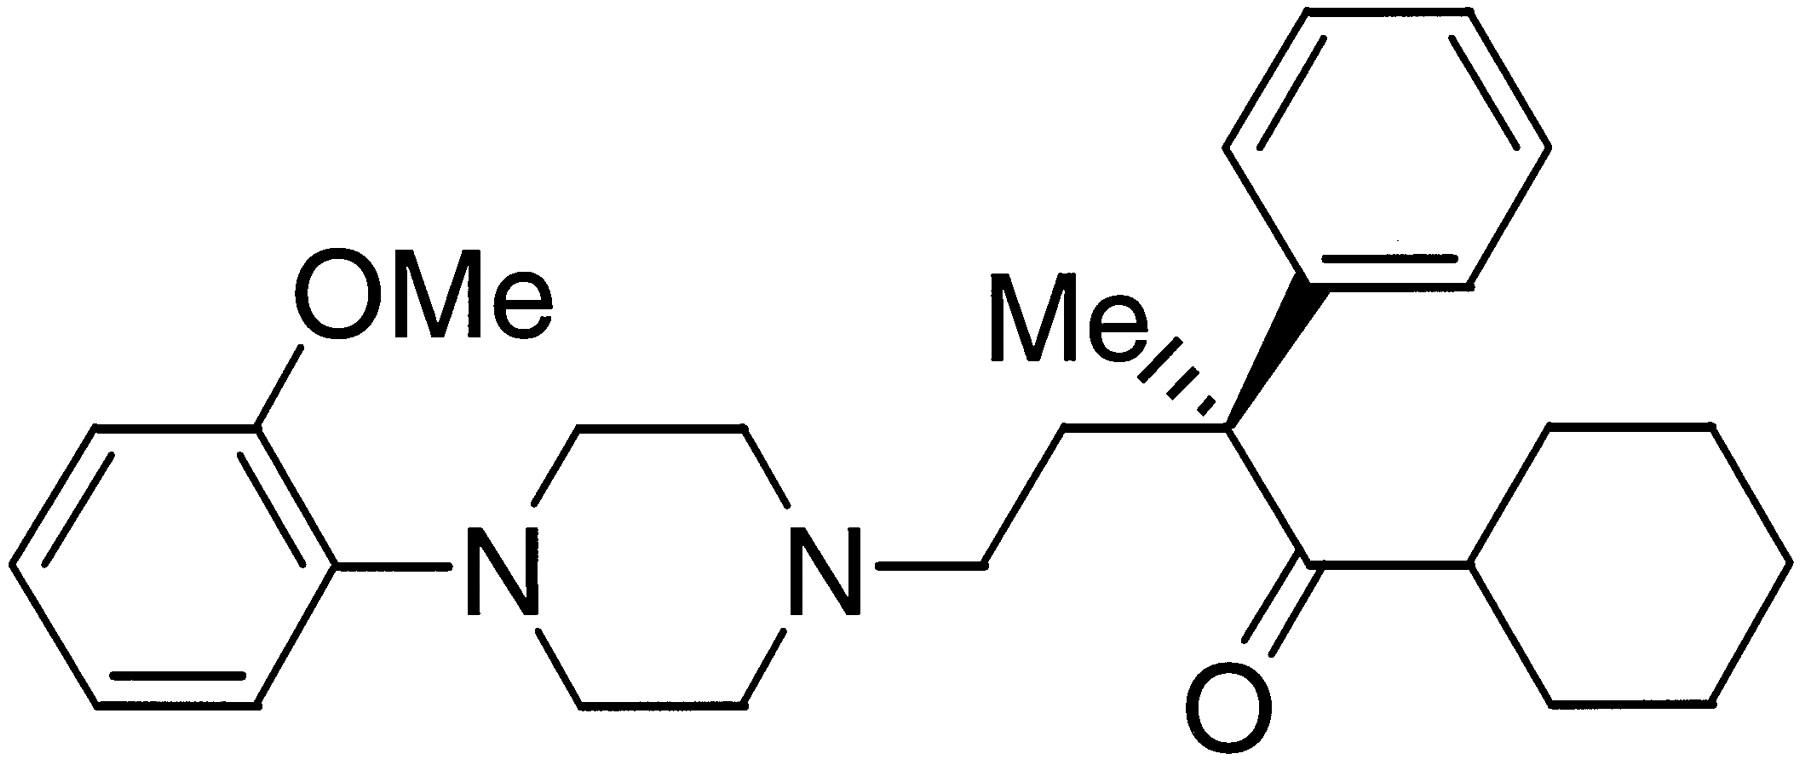 The Novel 5-Hydroxytryptamine1A Antagonist LY426965